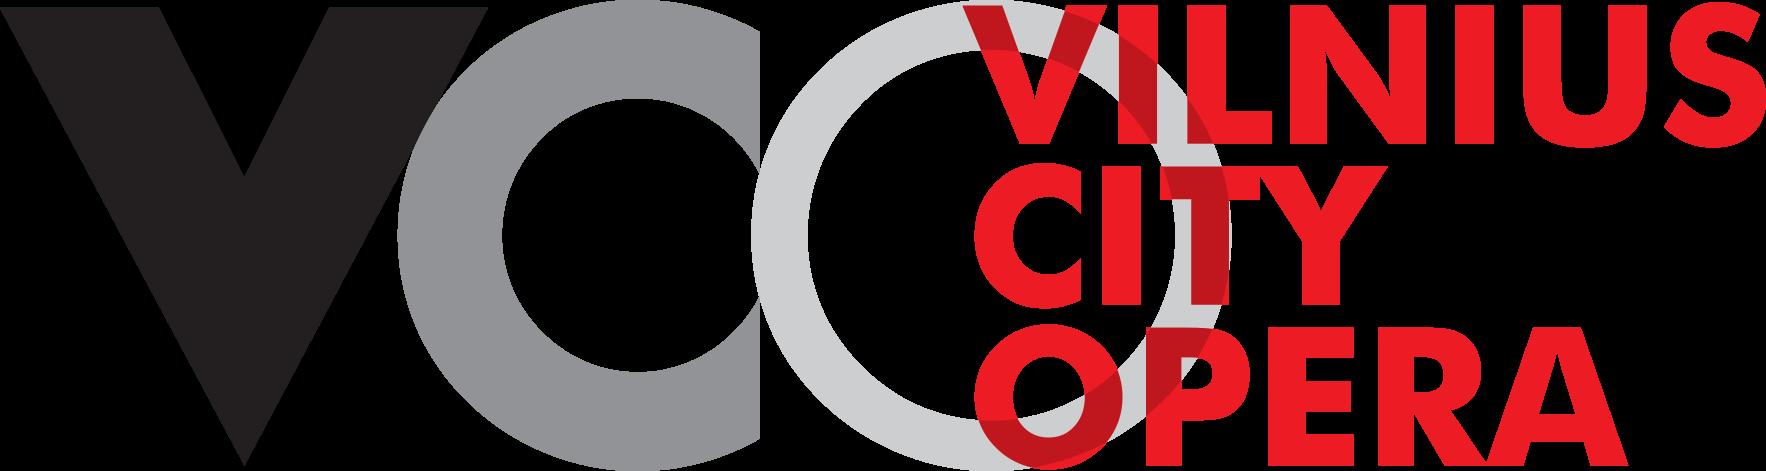 vco-vilnius-city-opera